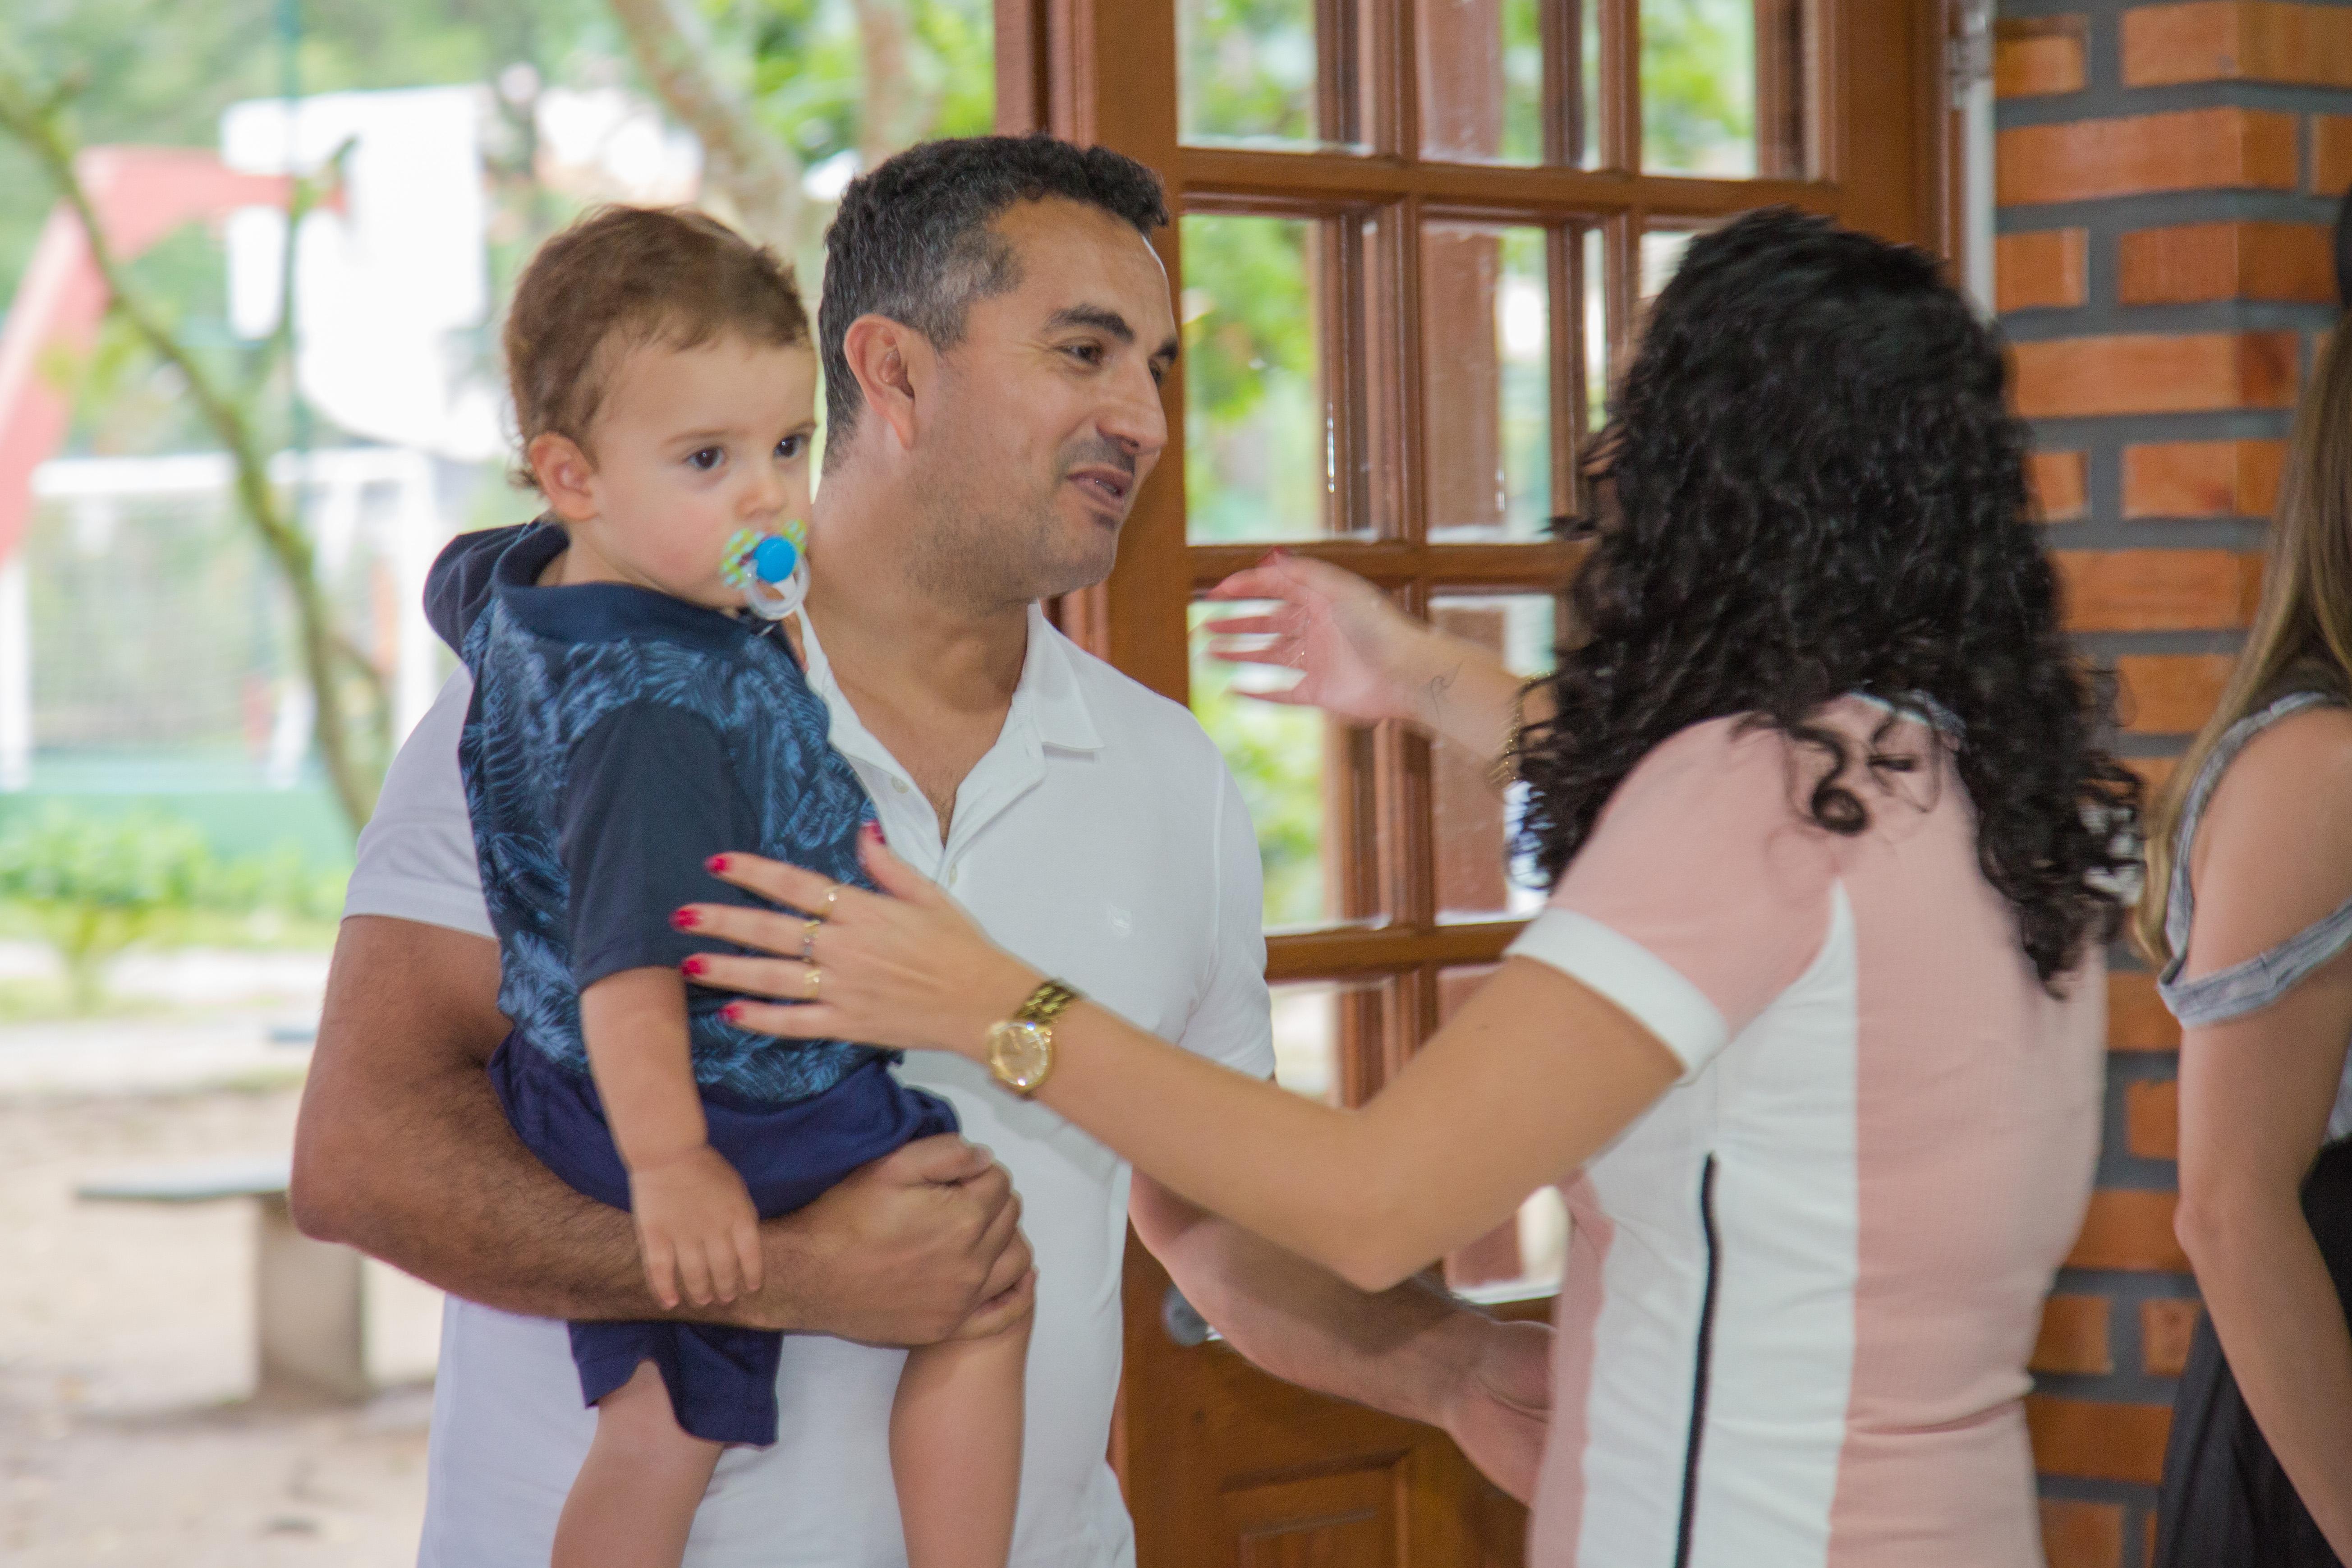 Festa‐Infantil‐Florianopolis‐Ana‐Marmo‐FotografiaFesta‐Infantil‐Florianopolis‐Ana‐Marmo‐Fotografia191A0580